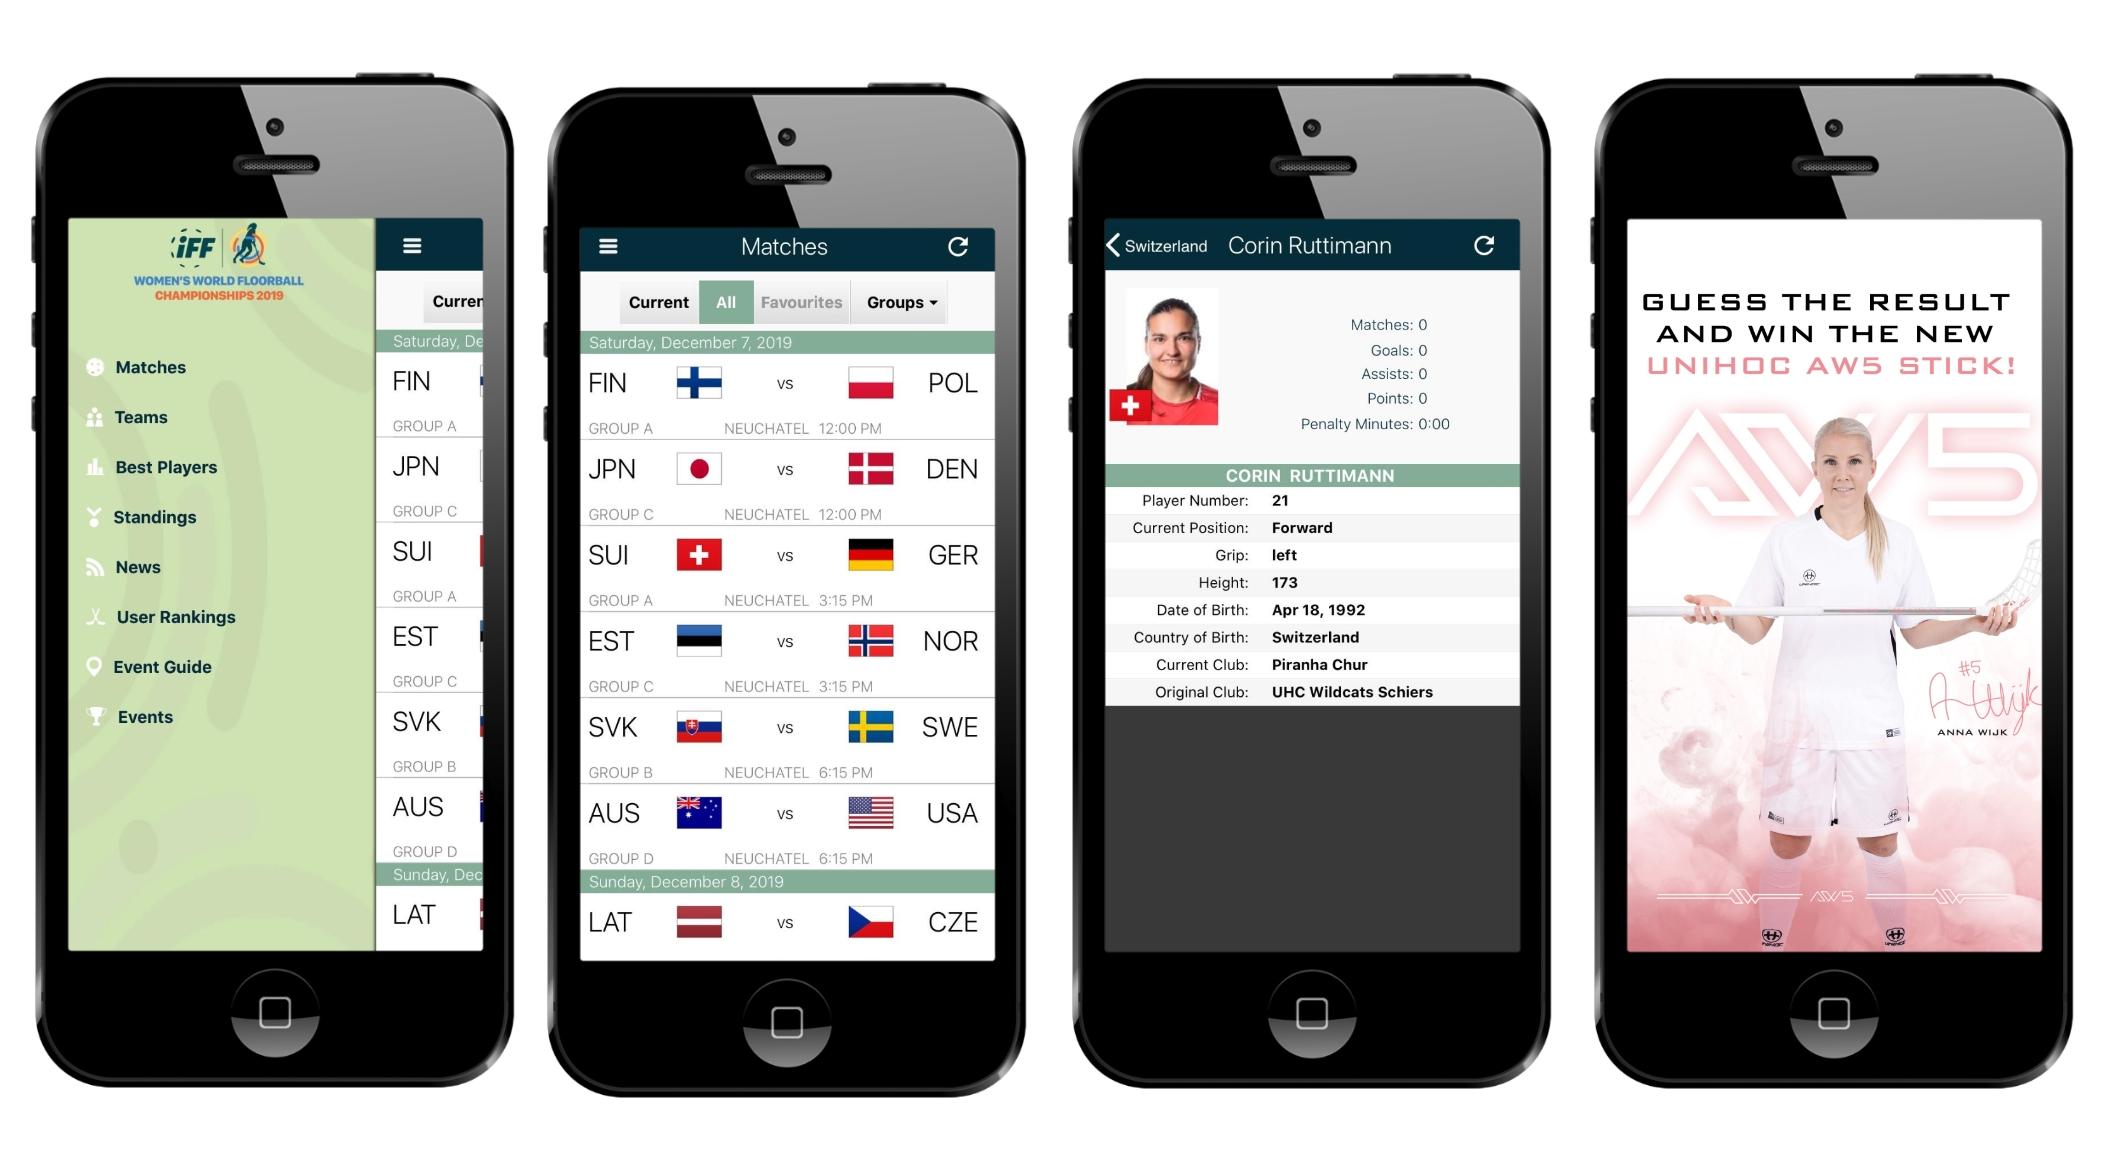 rådmansö dating apps norra nöbbelöv speed dating